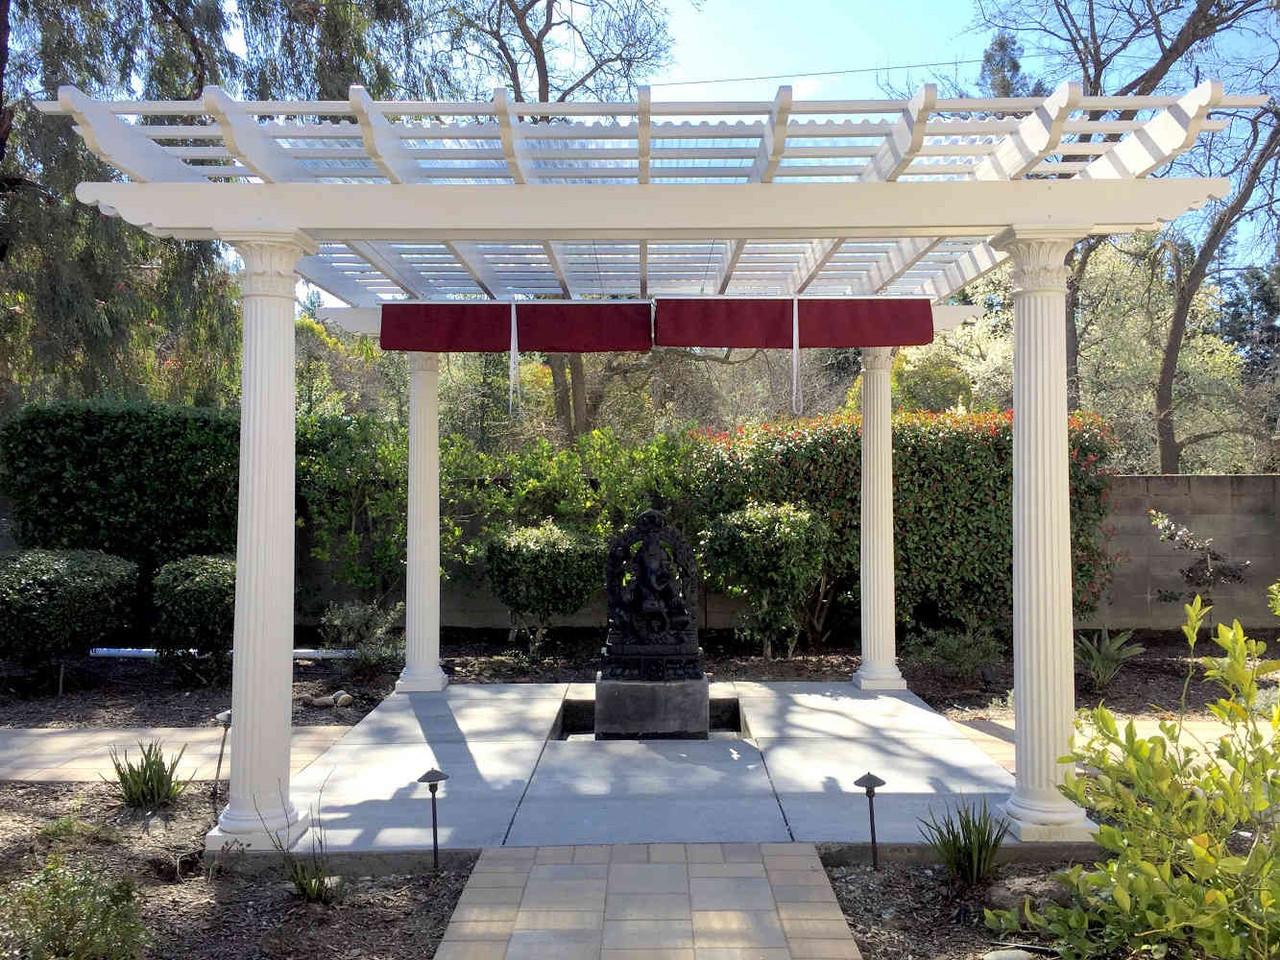 16x16 Fiberglass Pergola with Retractable Canopy, Danville, CA